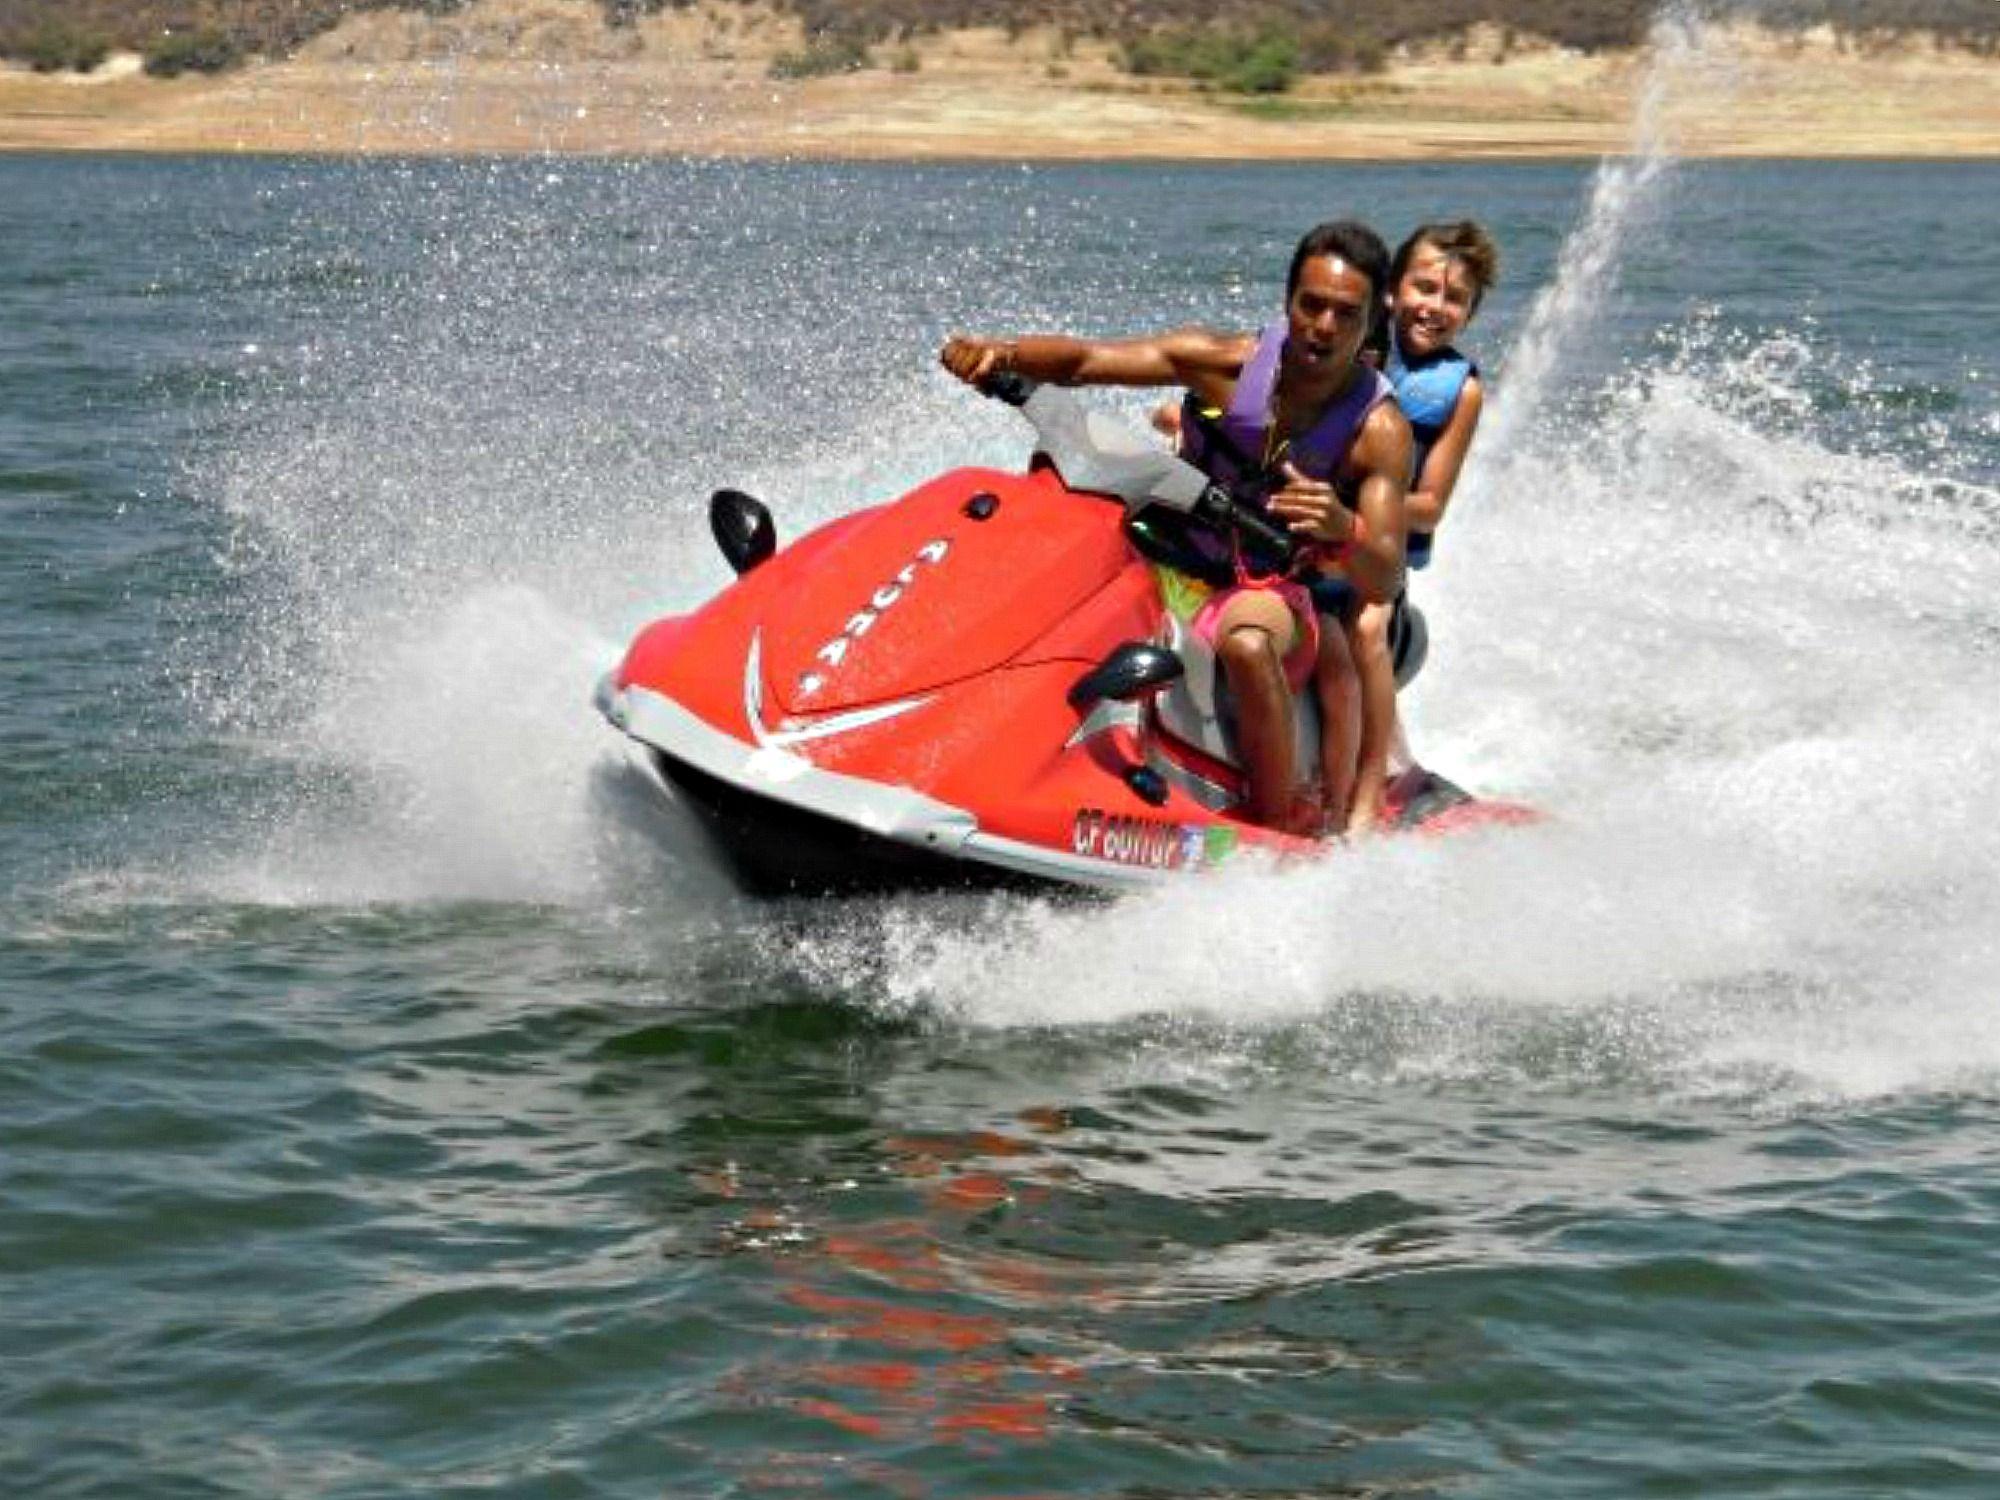 Summer Camp Jet Skiing Aloha Beach Castaic Lake Fun Waverunner Jetskiing Summercamp